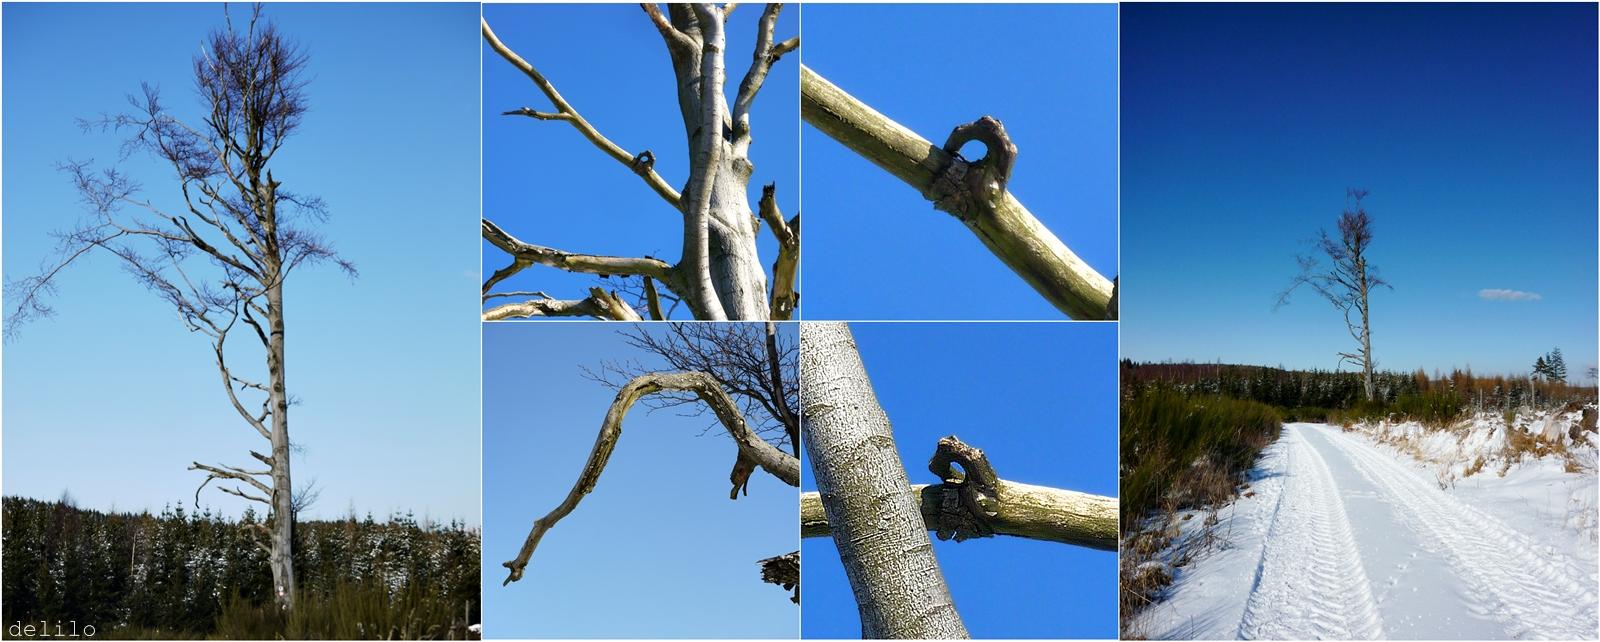 der morsche Baum